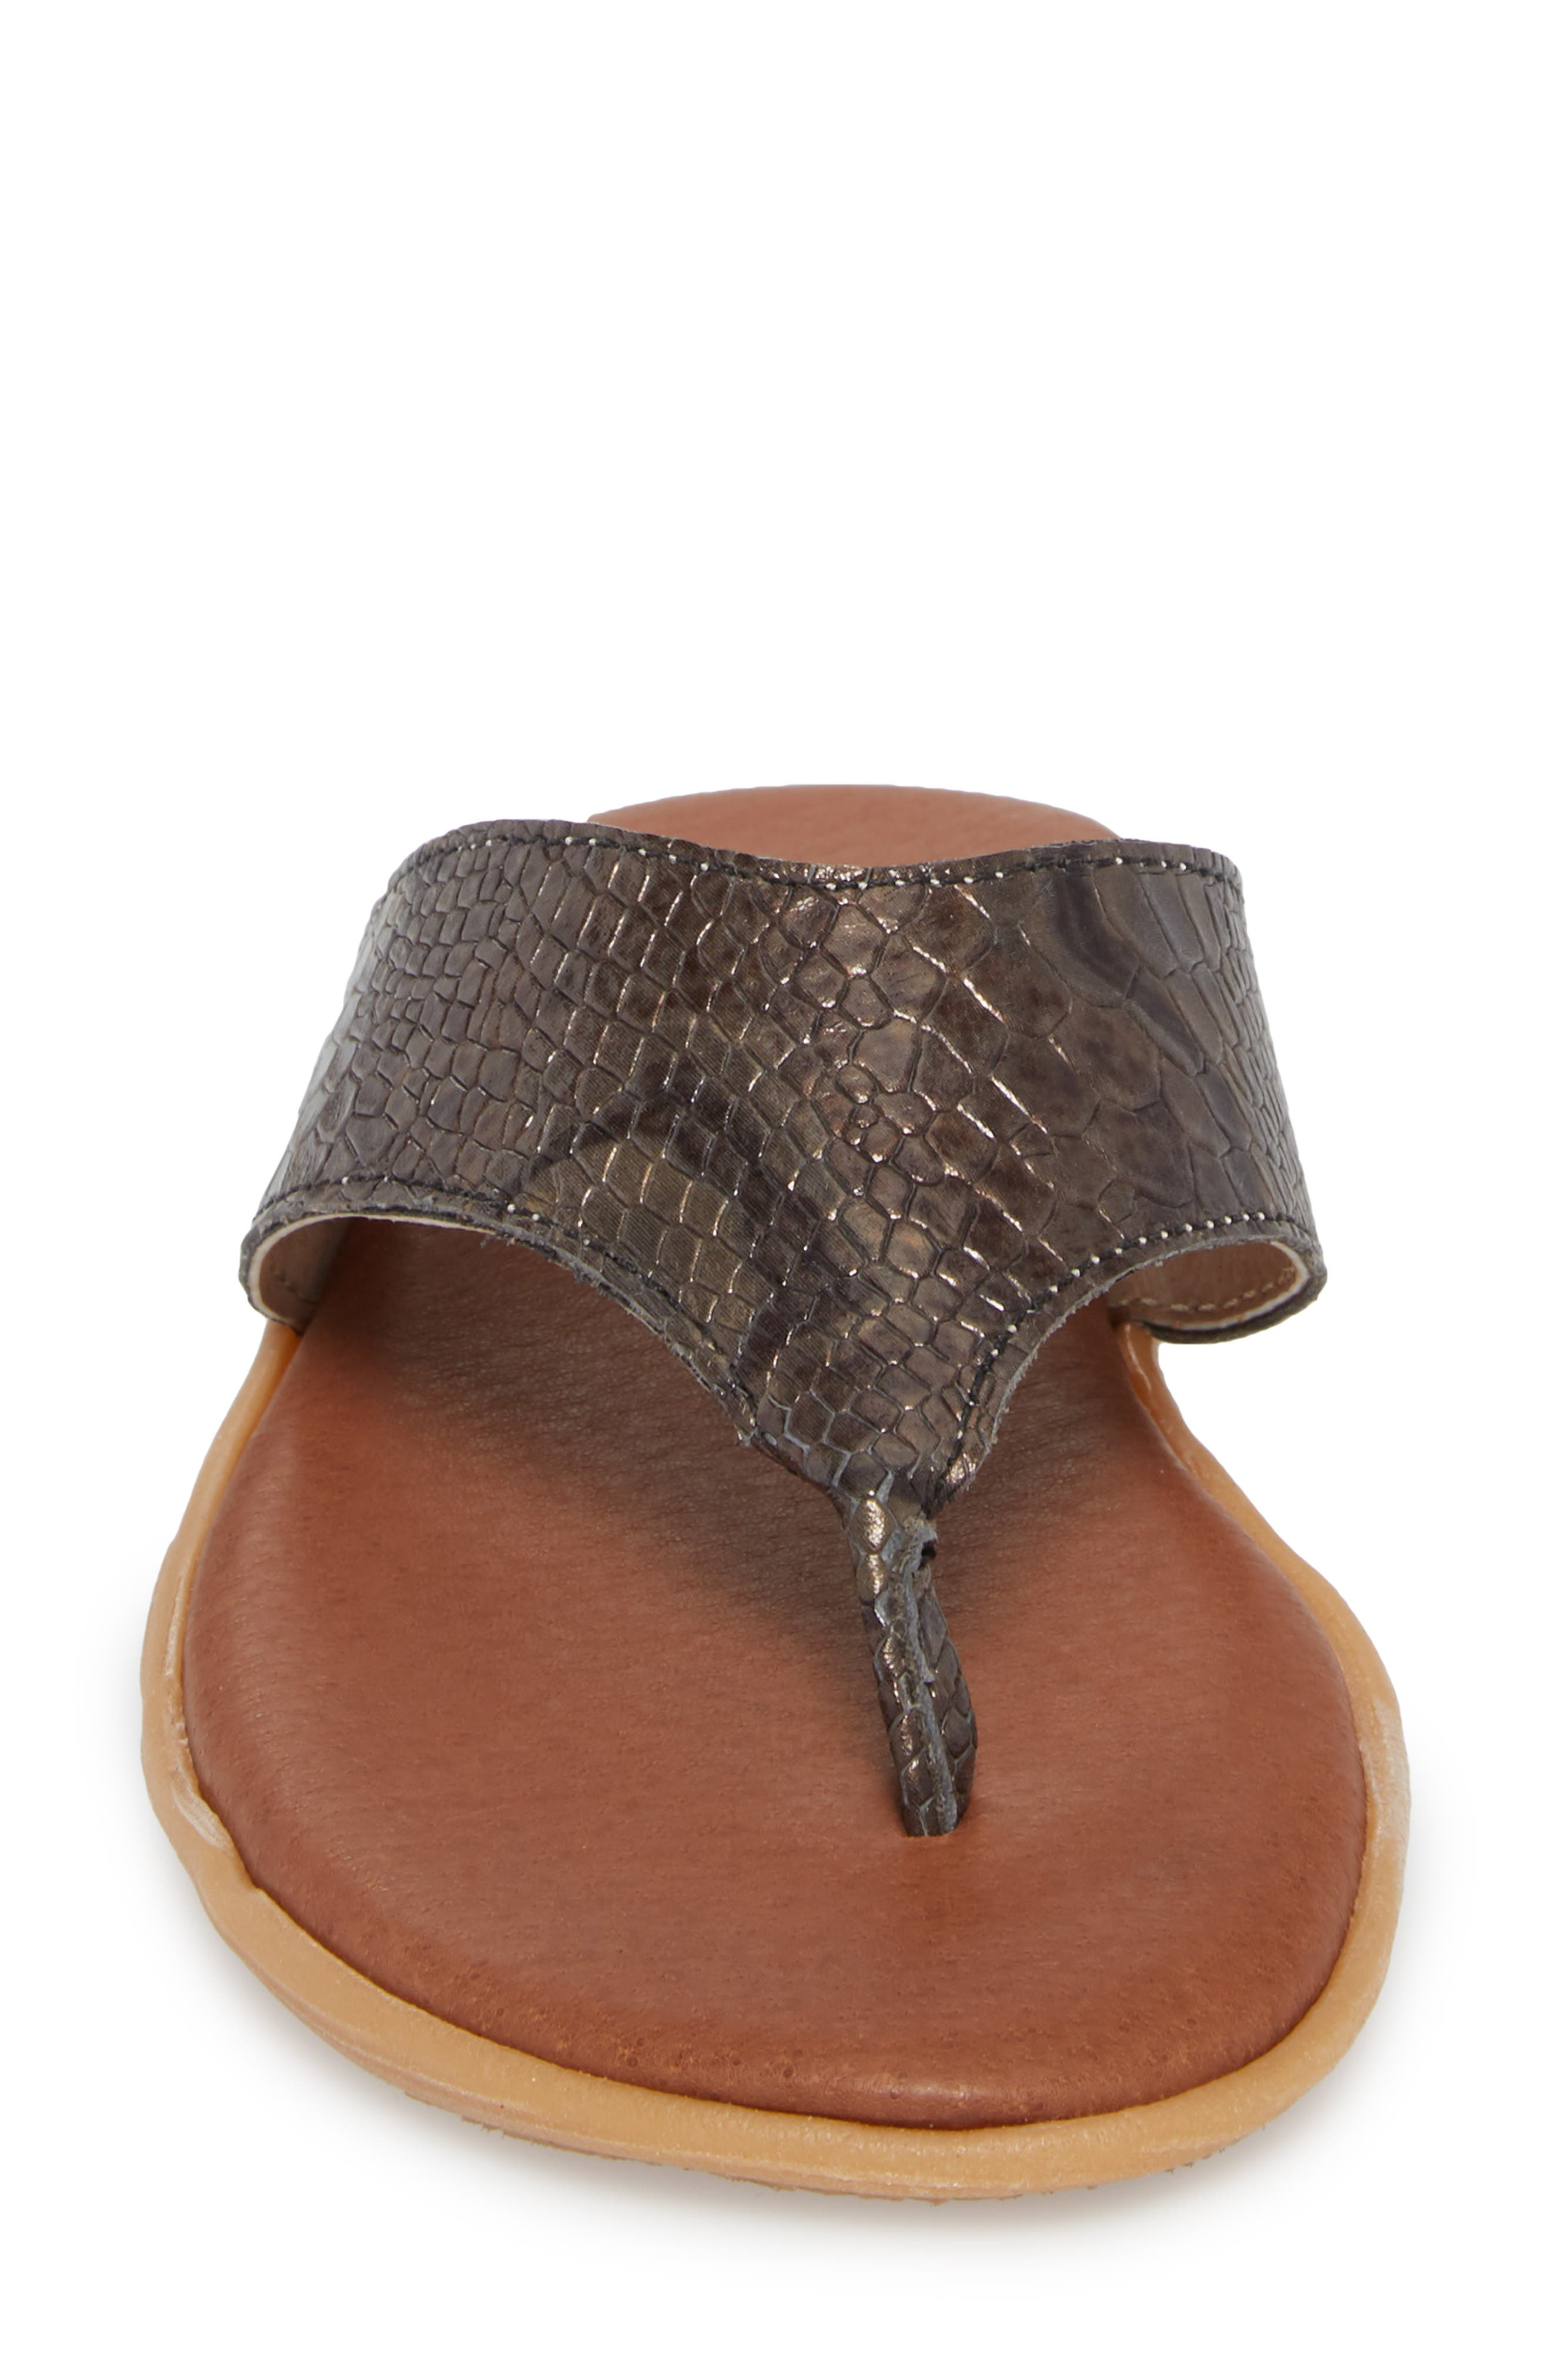 Flippity Flop Flip Flop,                             Alternate thumbnail 4, color,                             Snake Leather